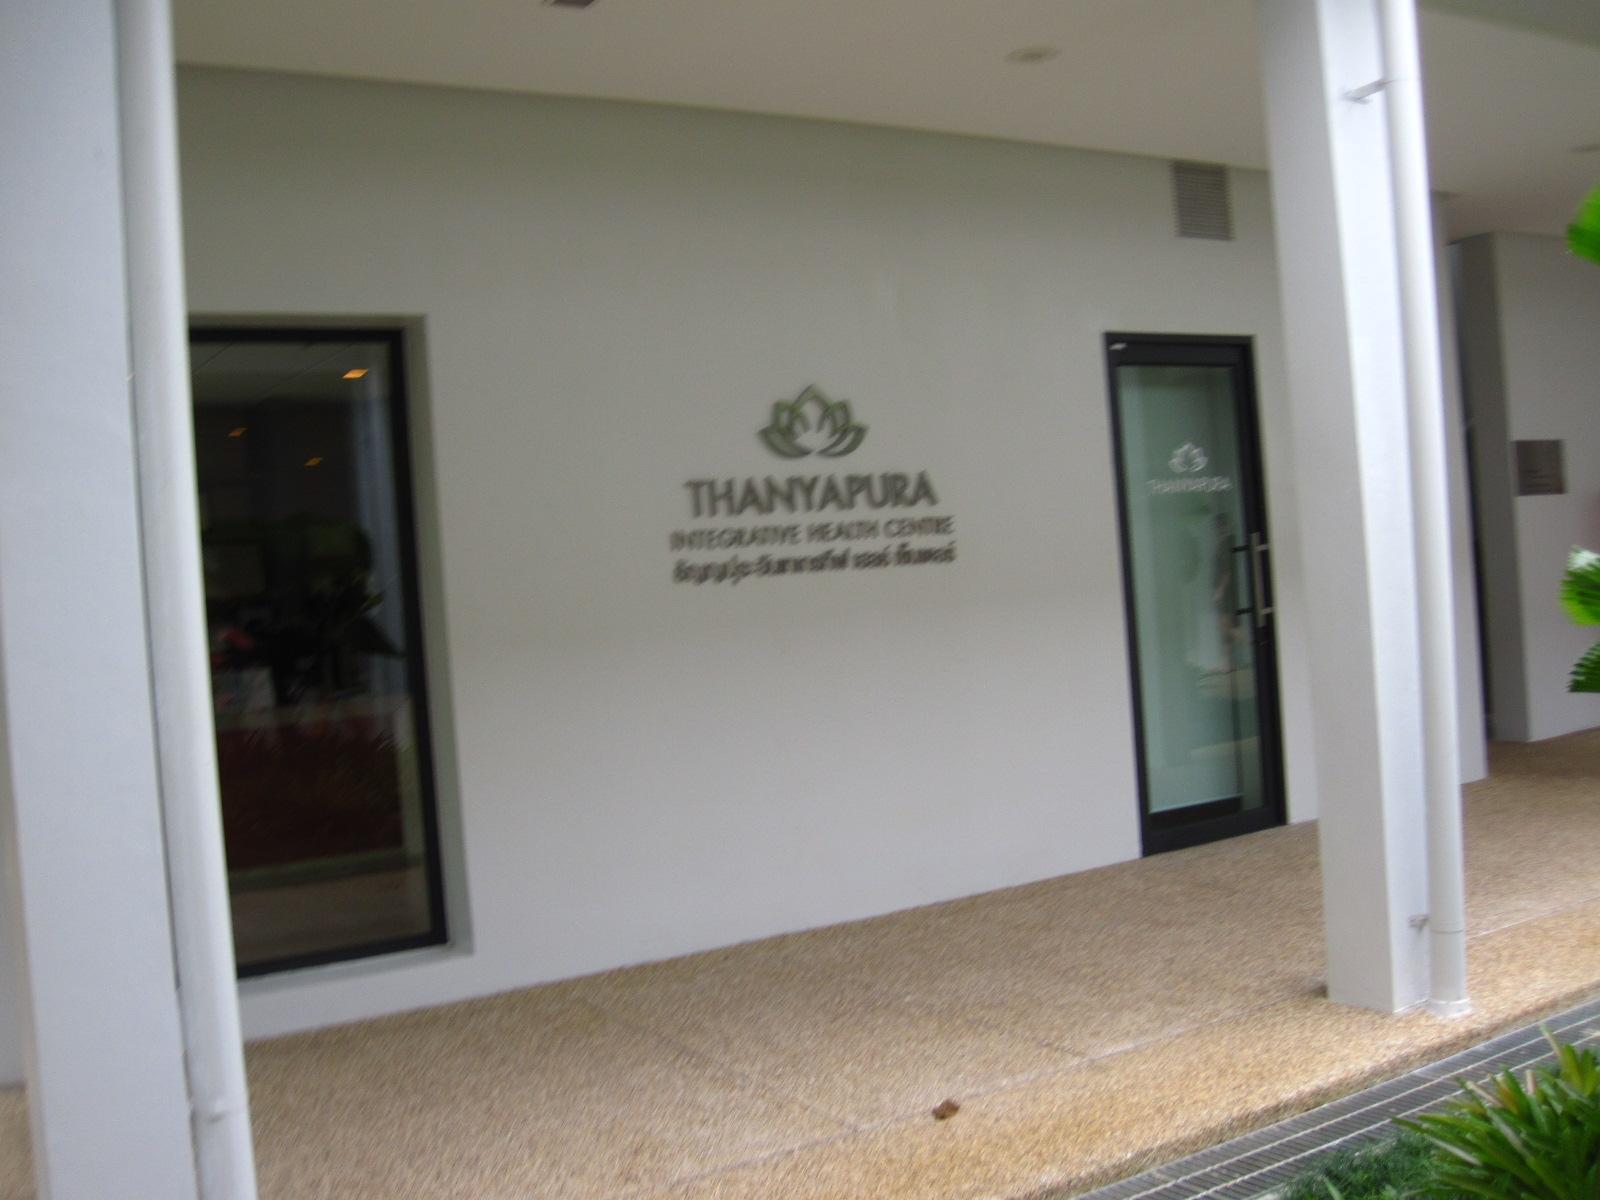 Thanyapura Integrative Health Centre